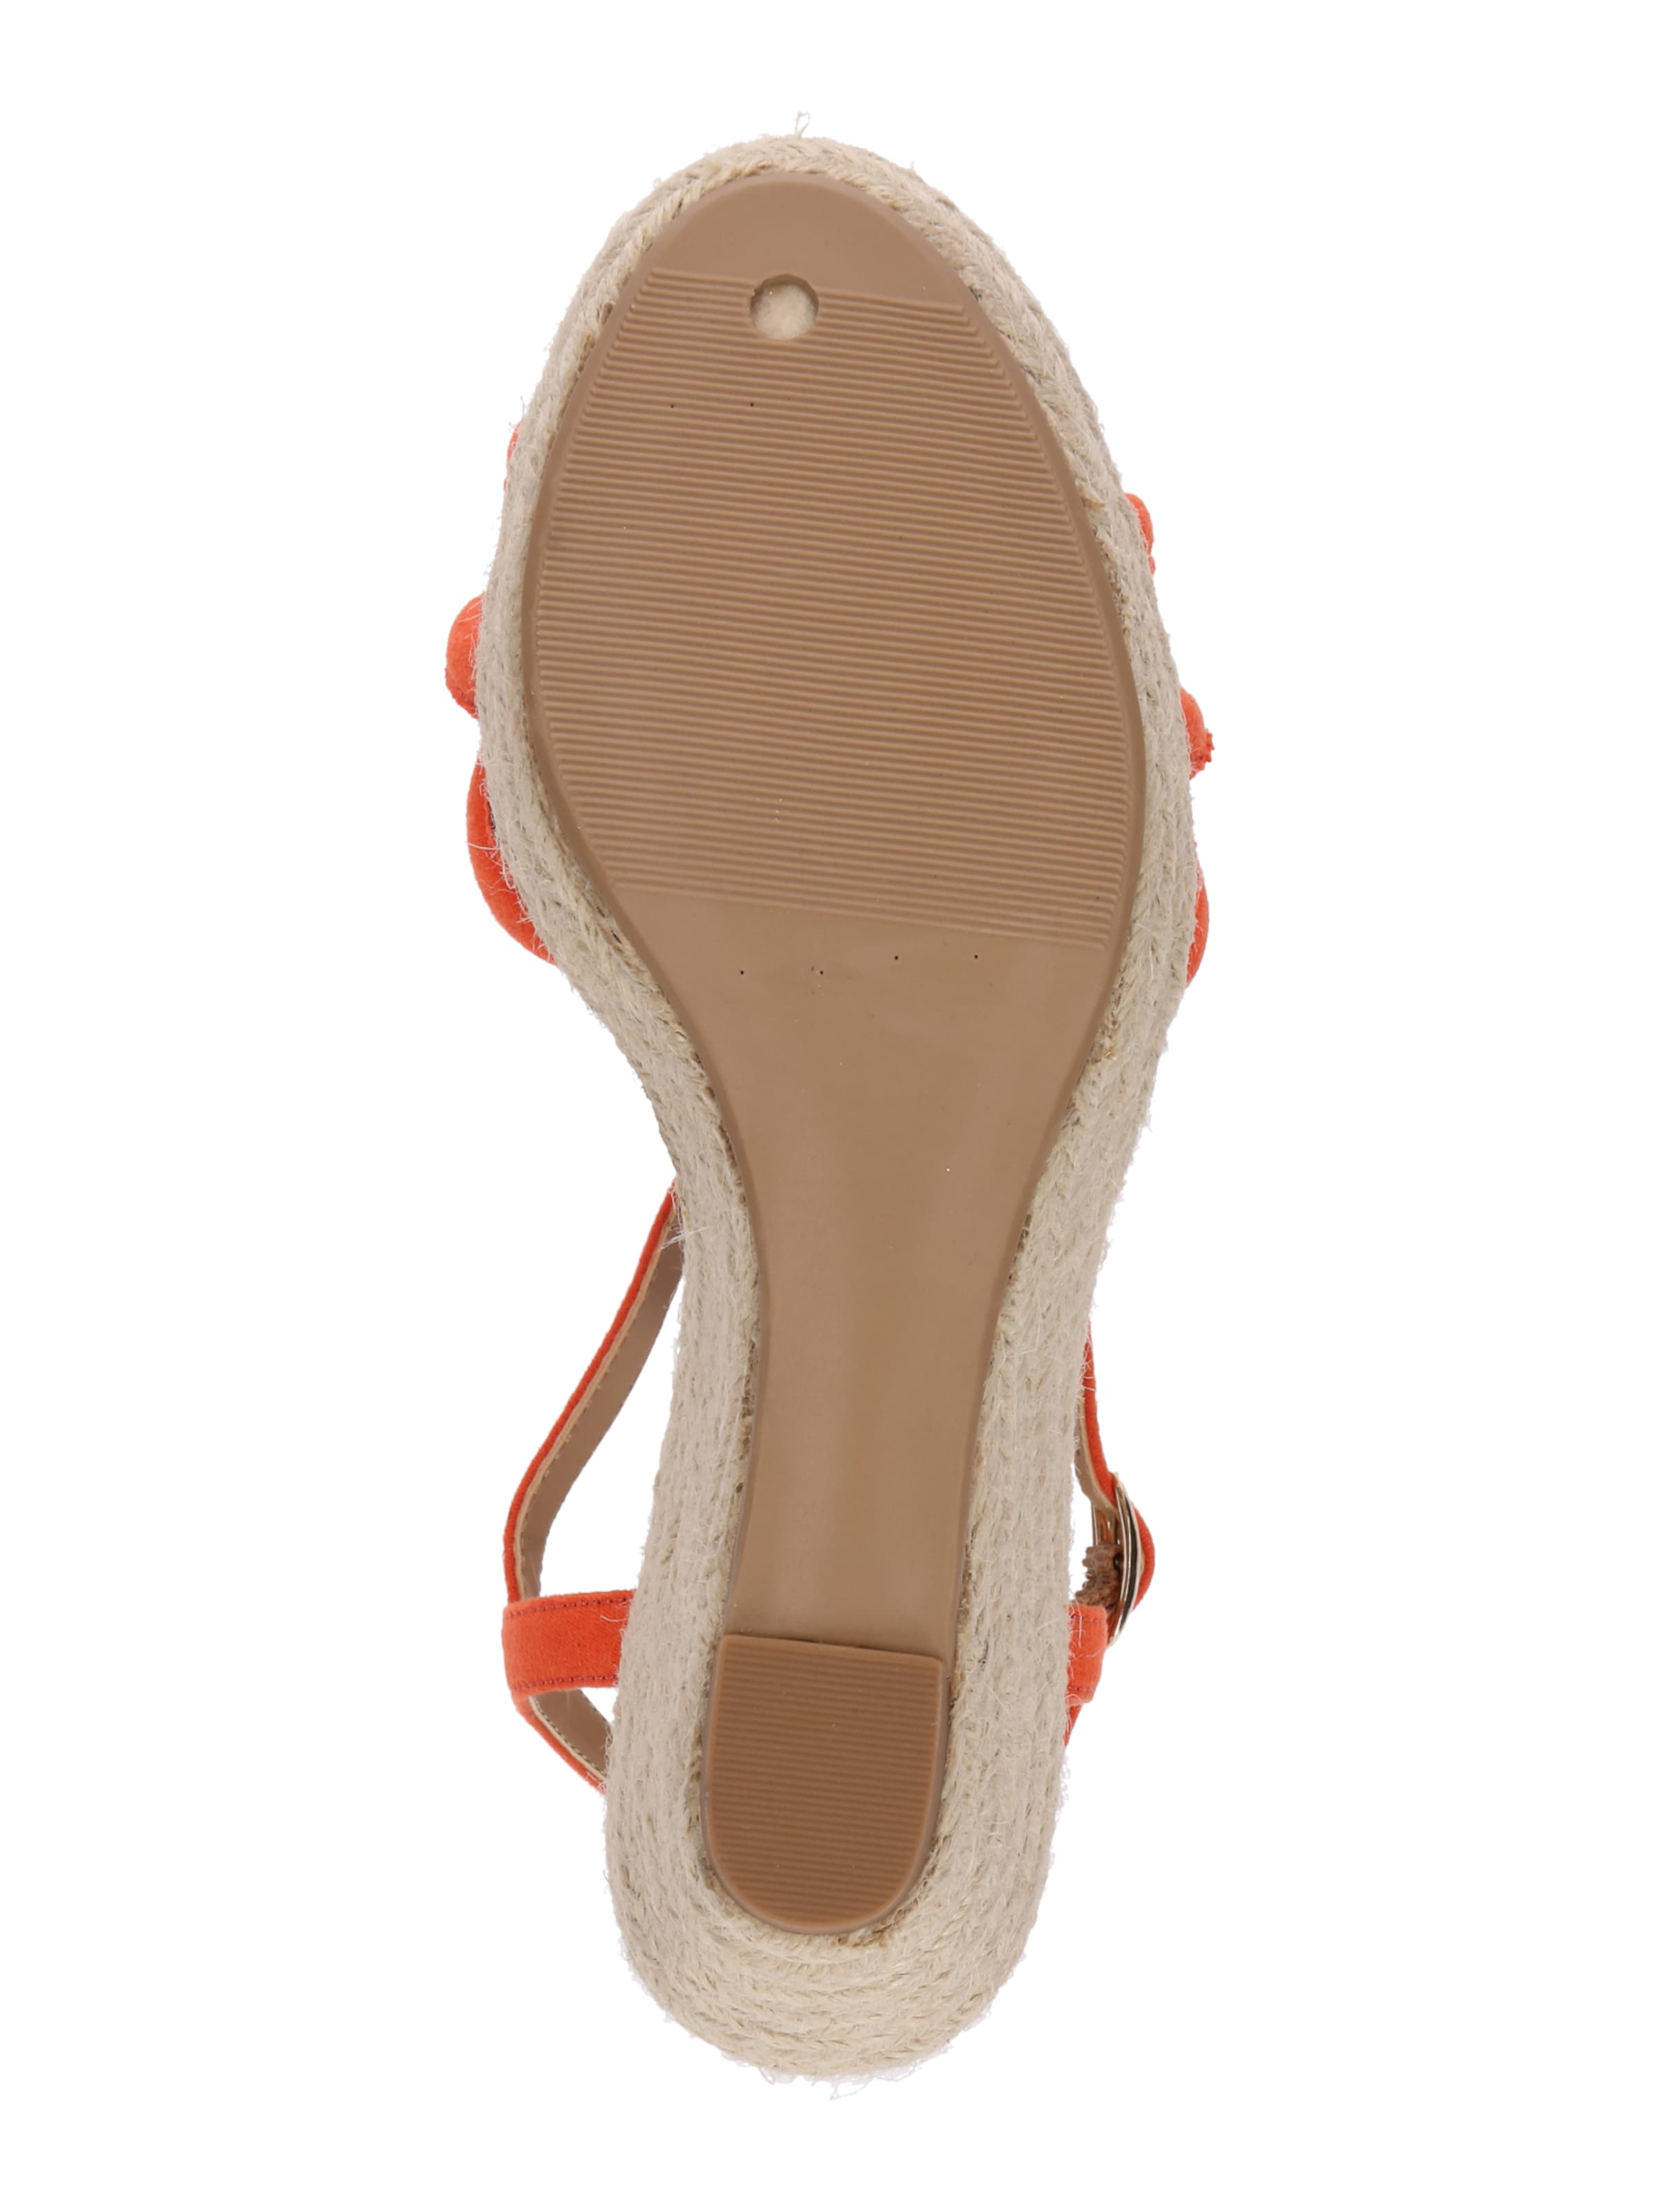 You About 'frances' Sandalette In Orangerot lFK1cuTJ35